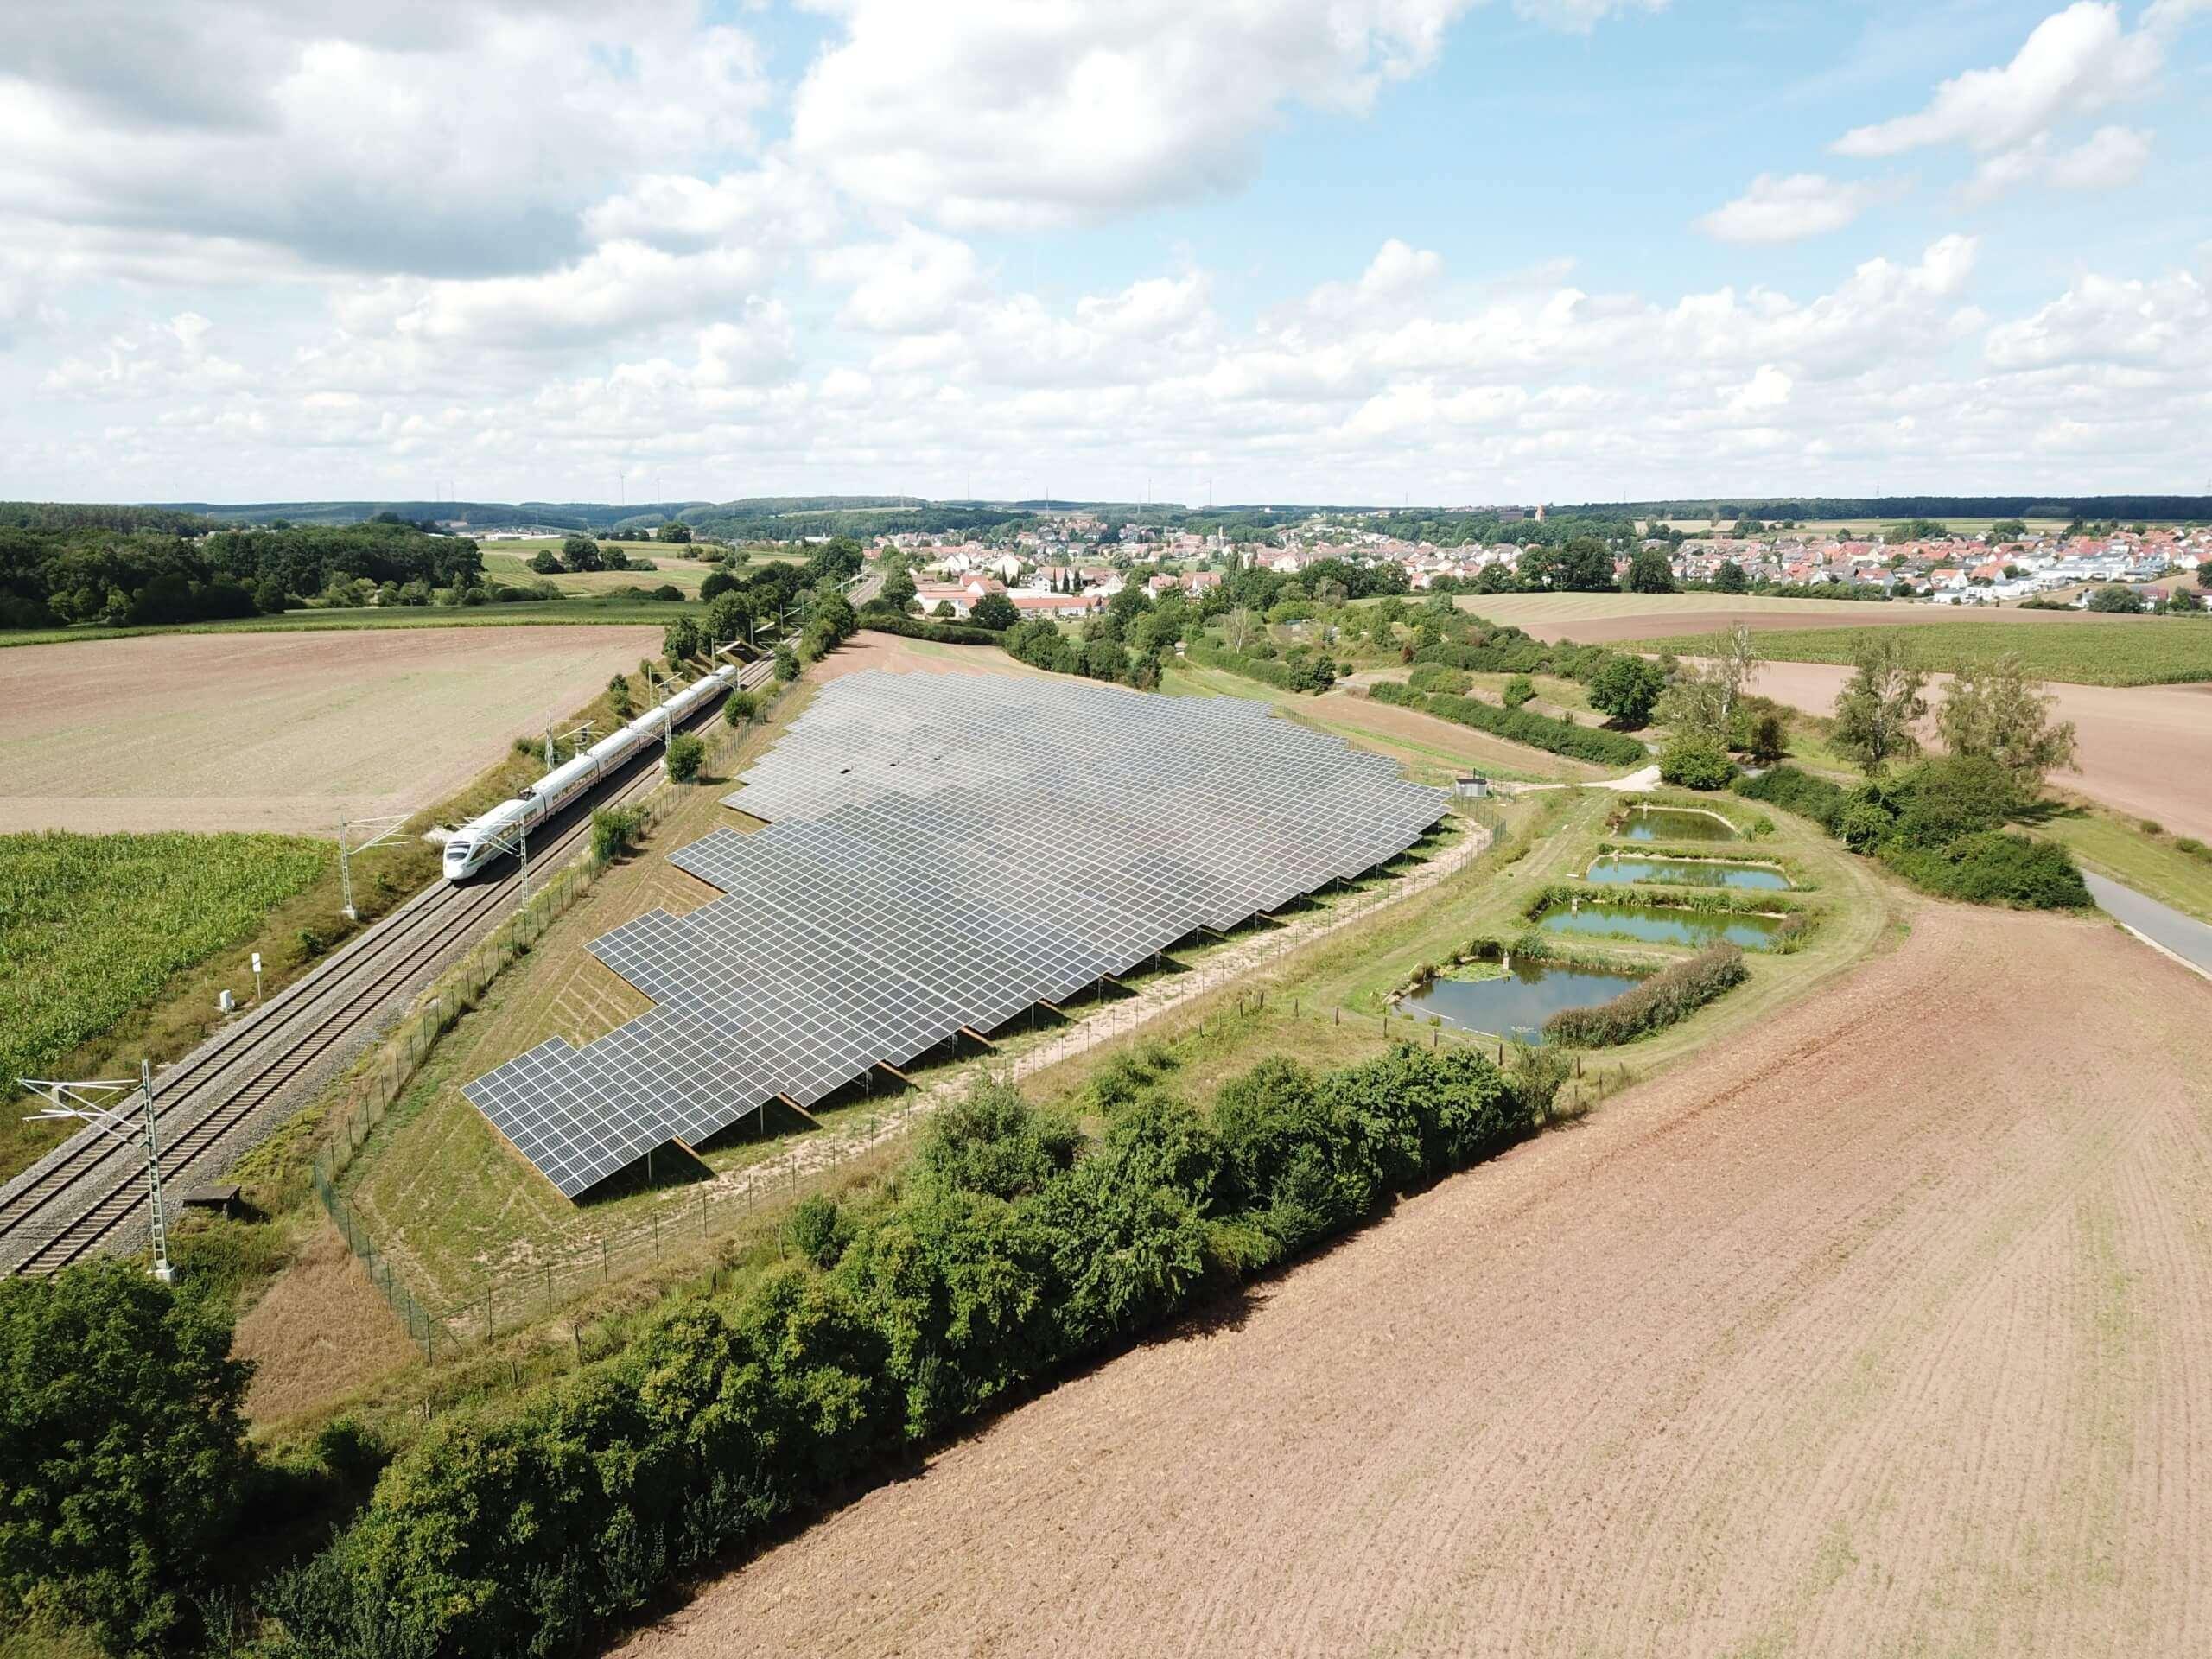 Solarpark Veitsbronn Luftbild